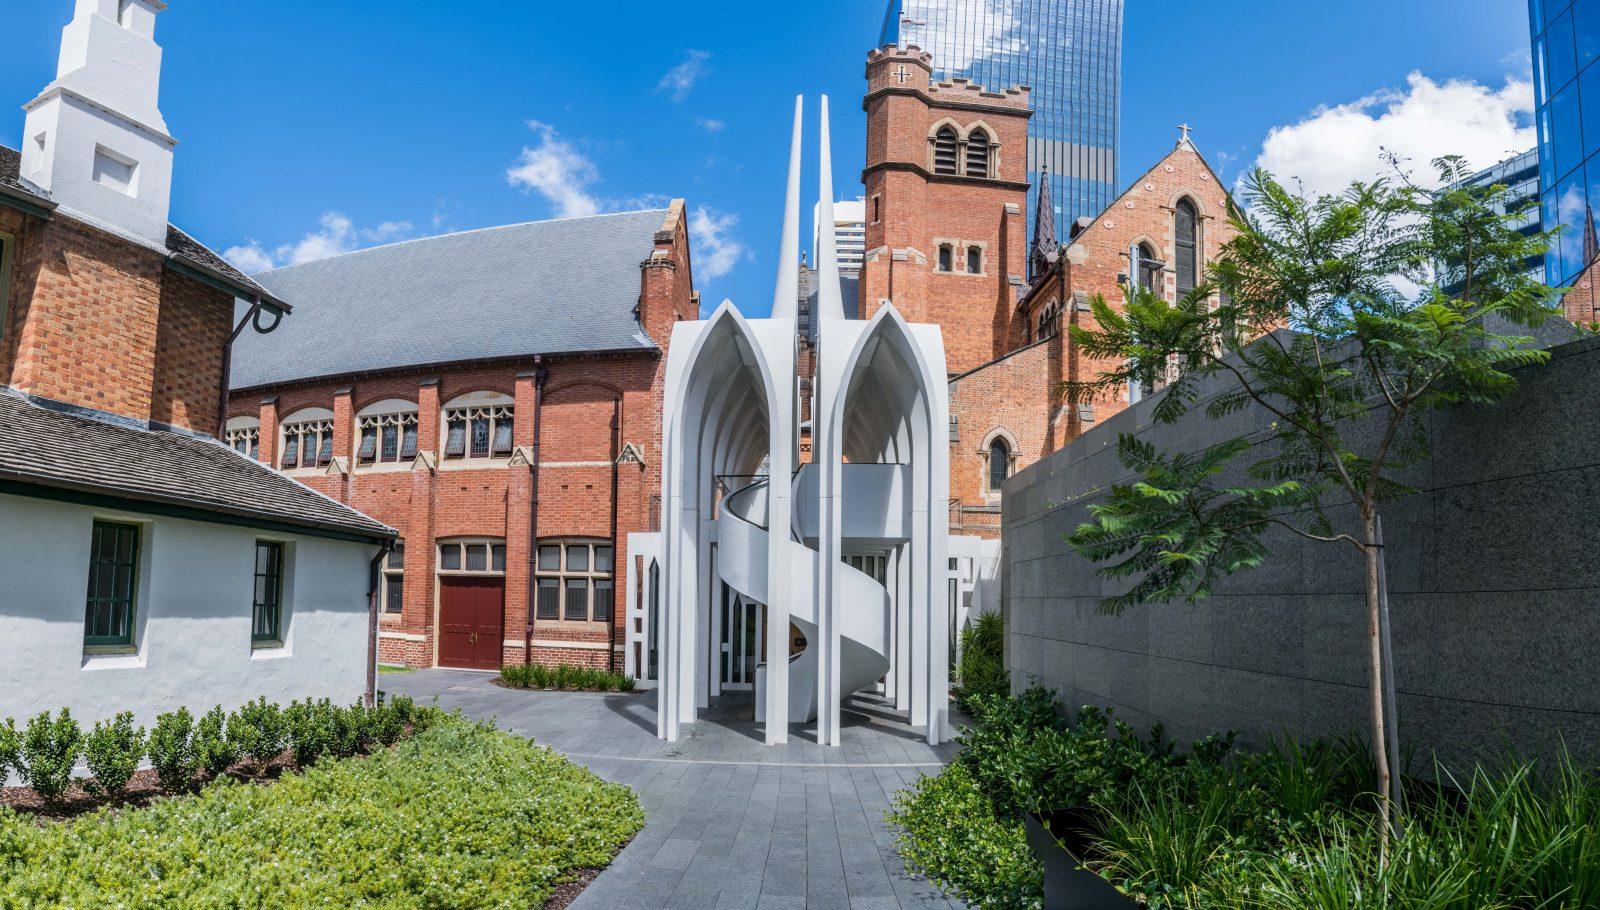 Burt Memorial Hall, Perth, Western Australia